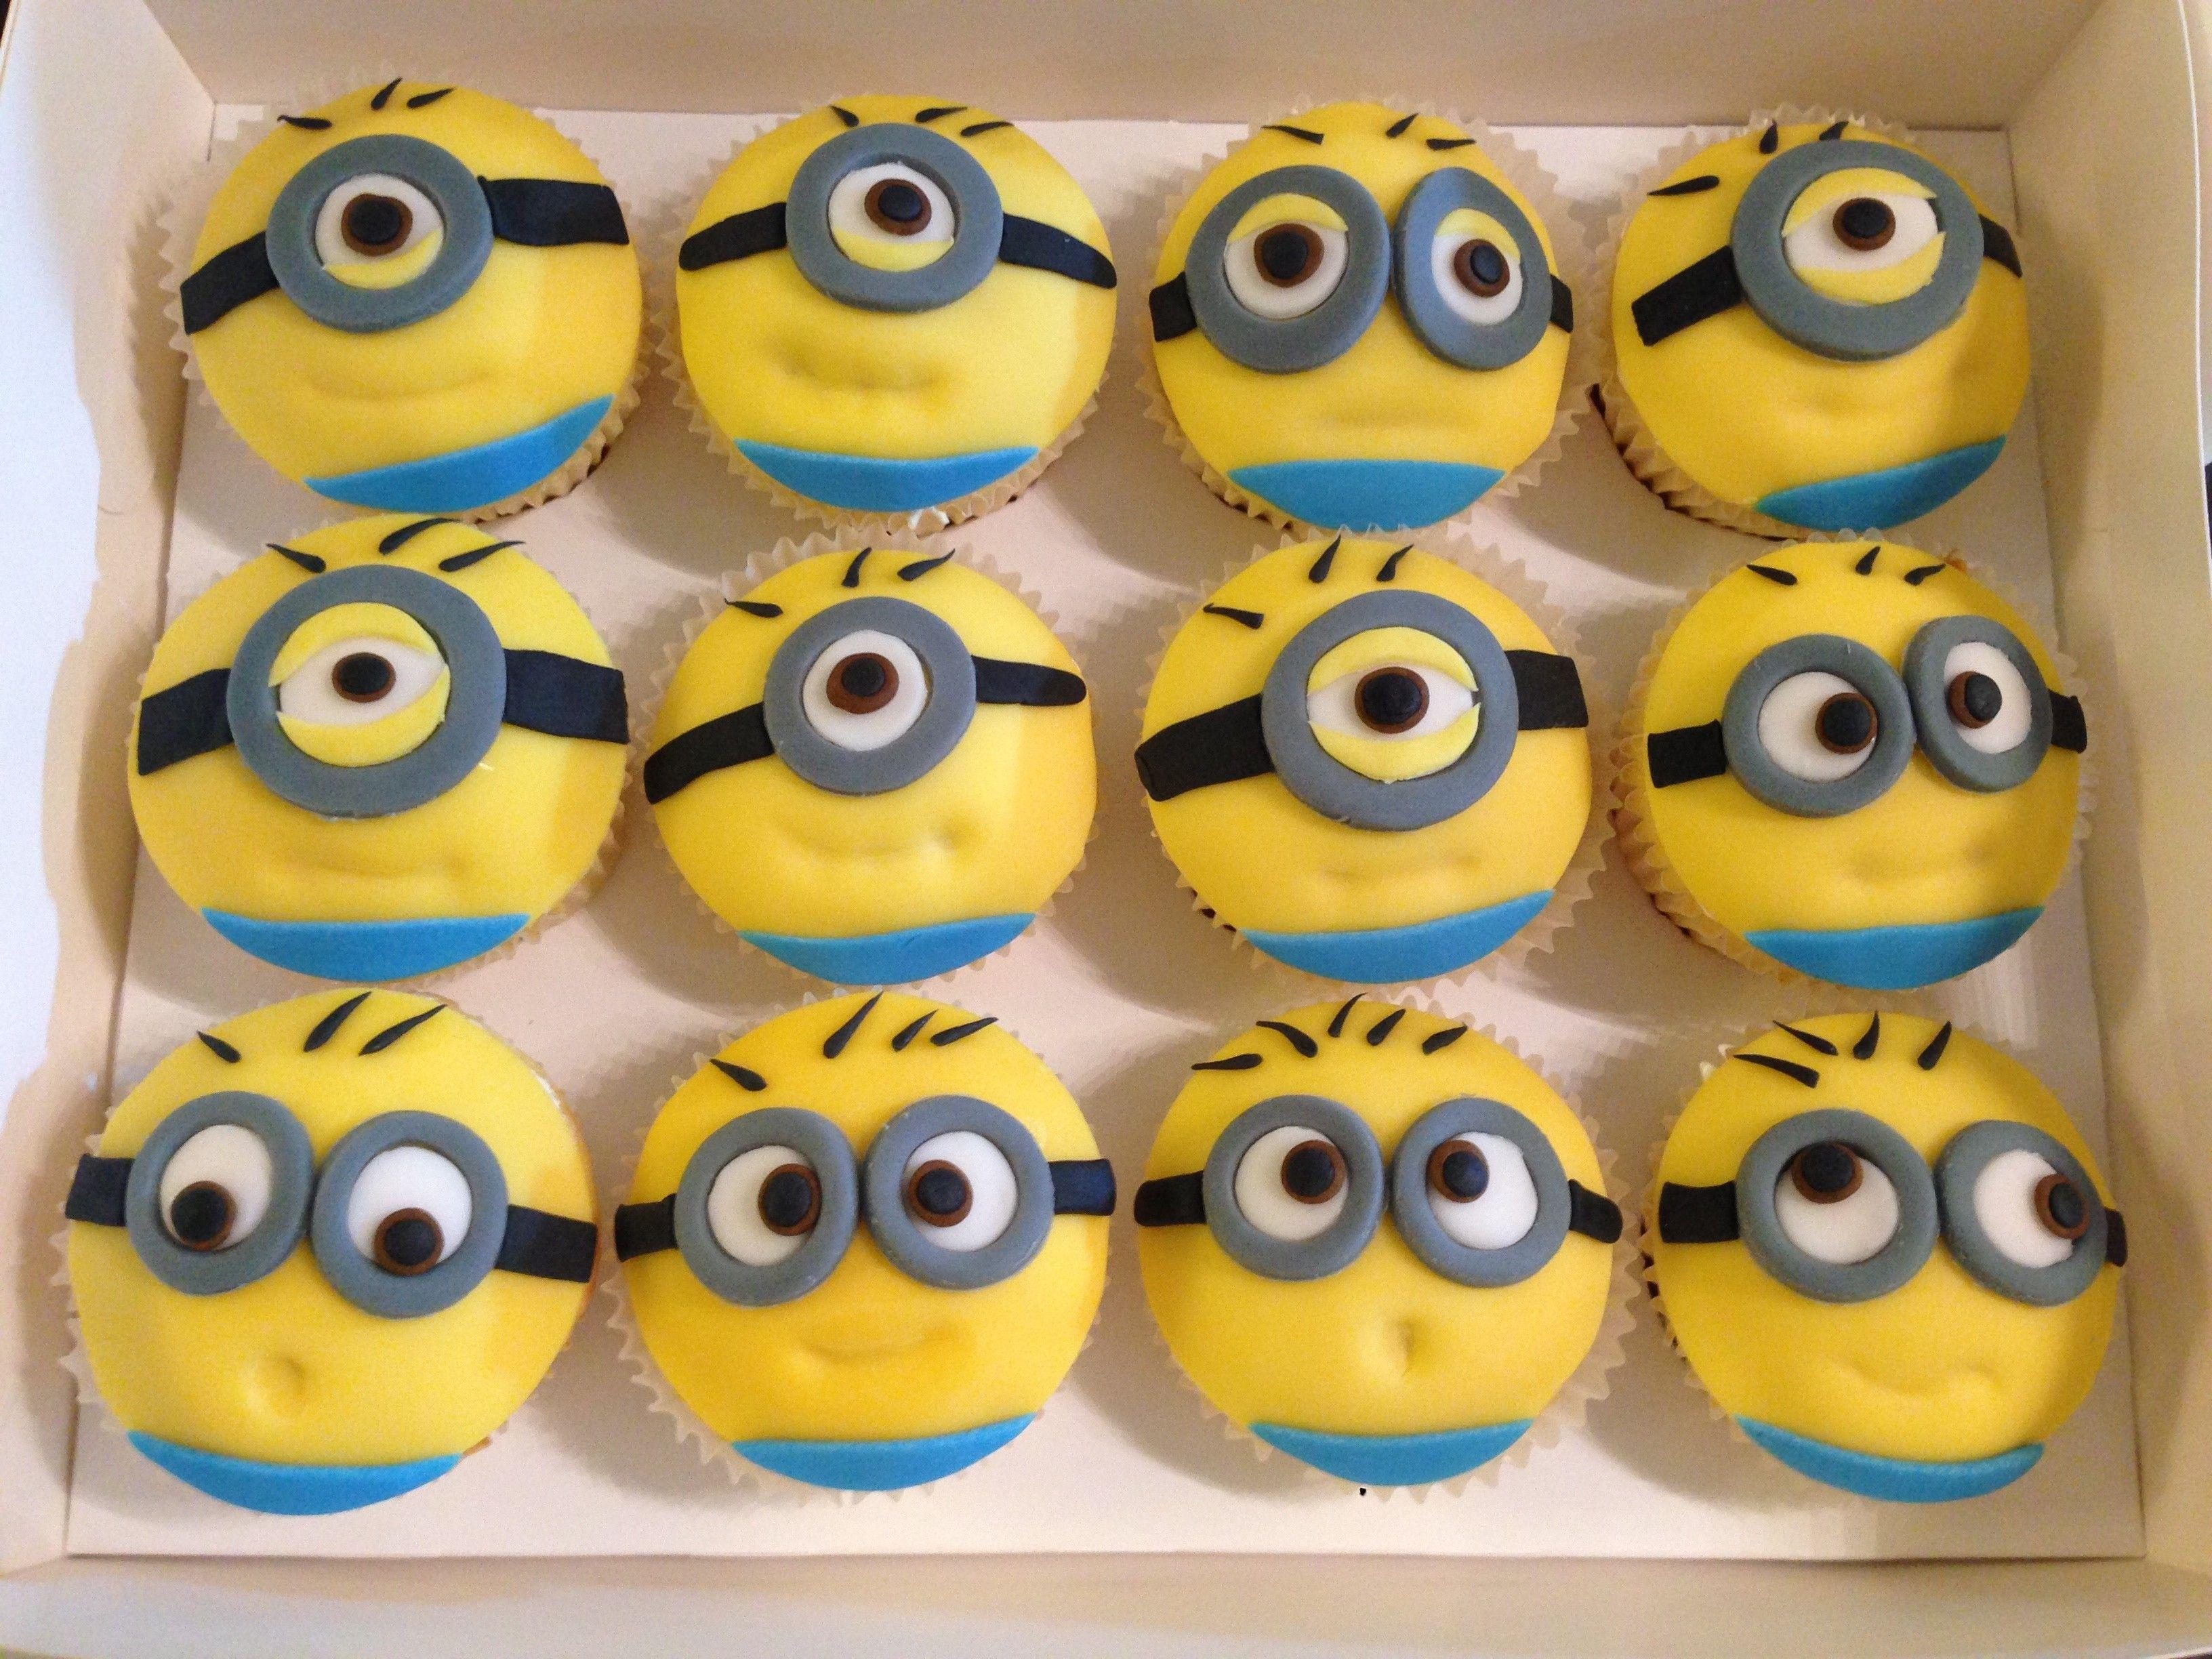 kevin the minion Google Search Minions Pinterest Cake